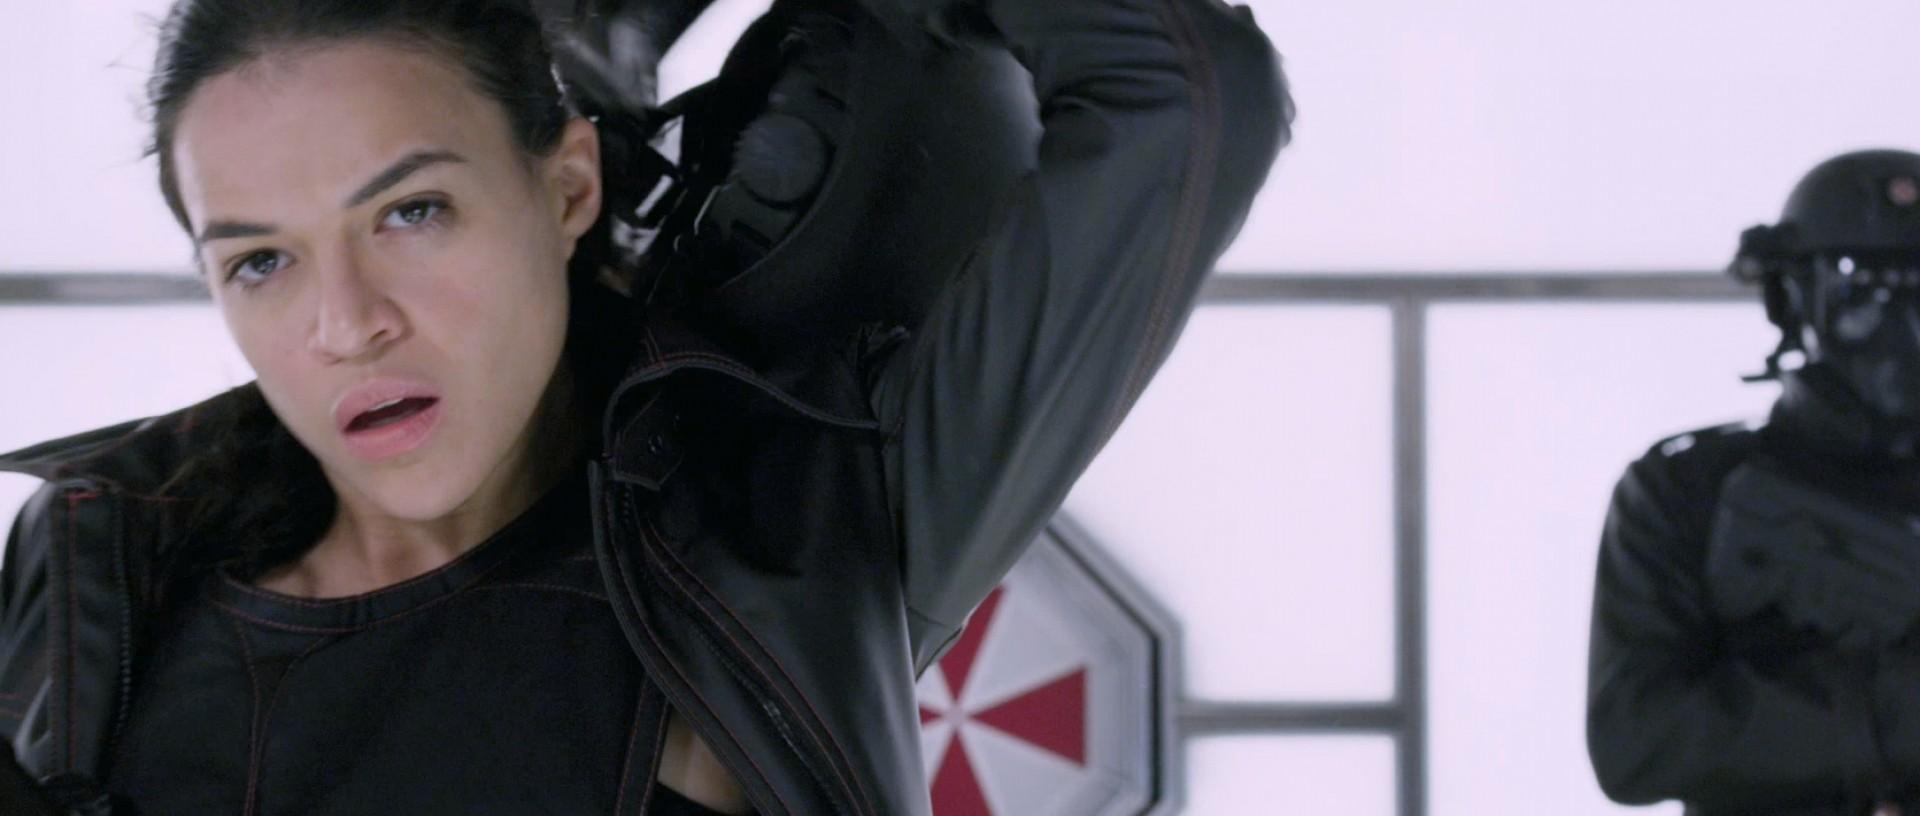 Resident Evil Retribution (2012) - One, Rain & Carlos